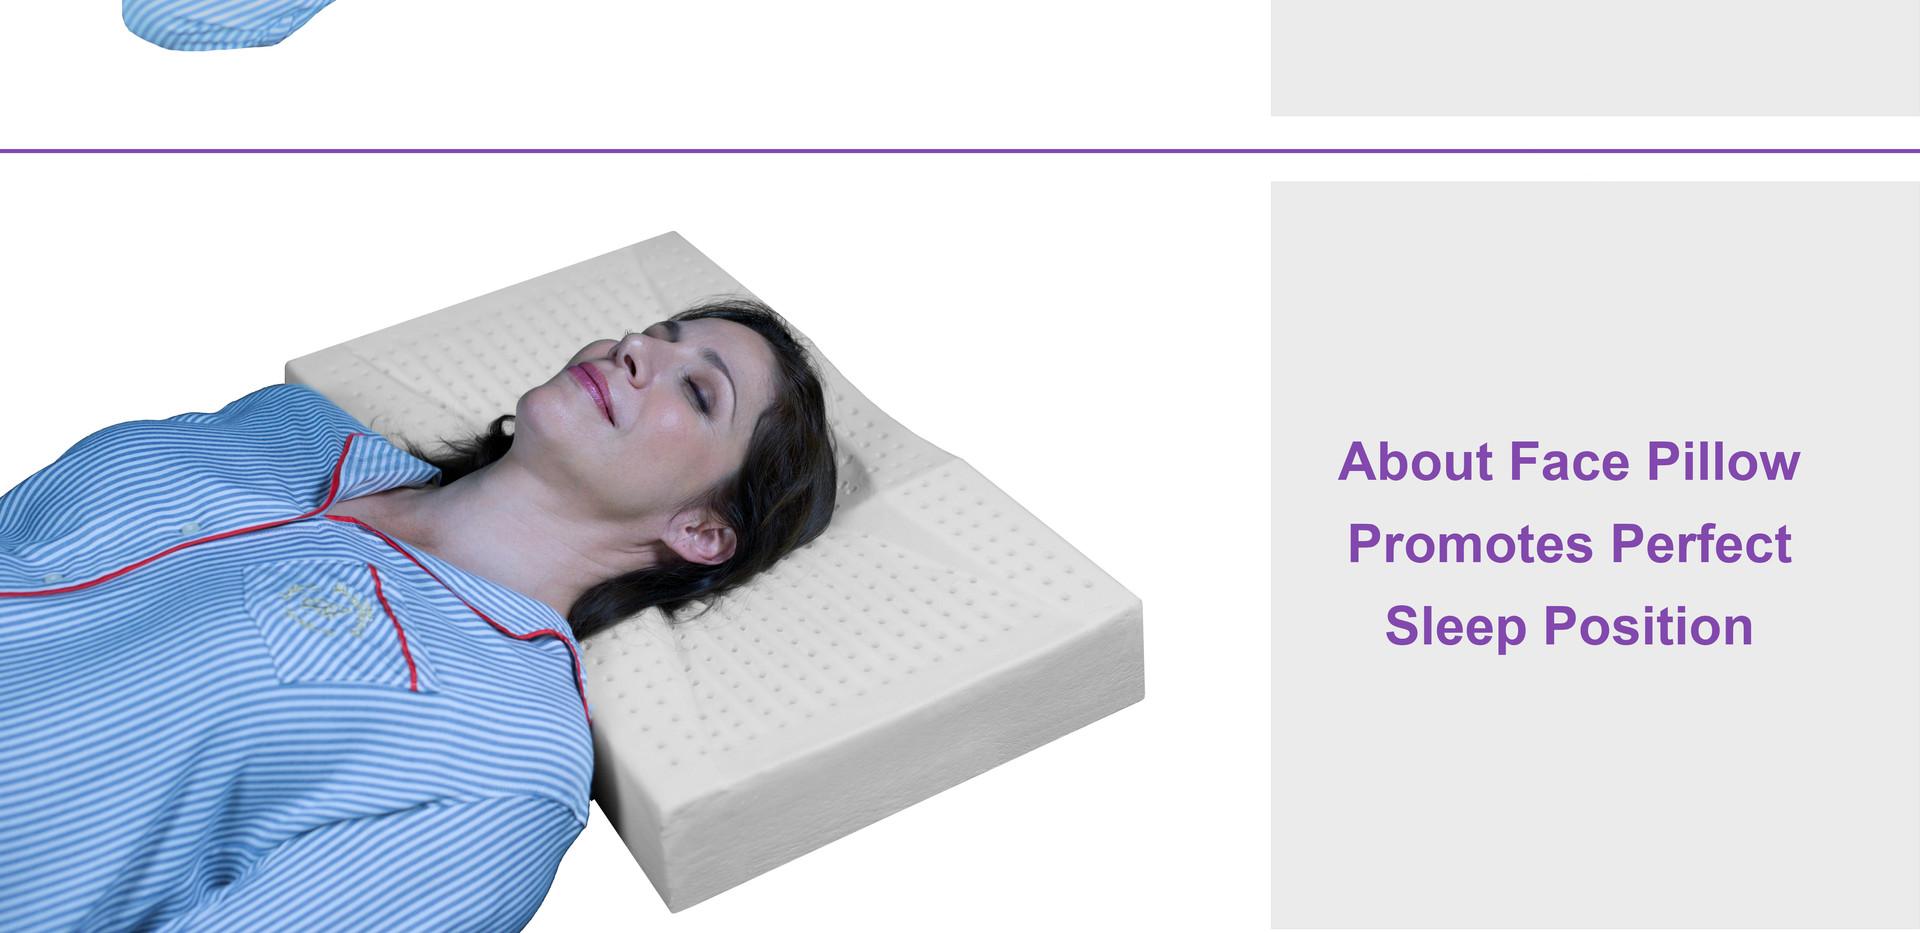 LumaLife Luxe Anti Wrinkle Pillow